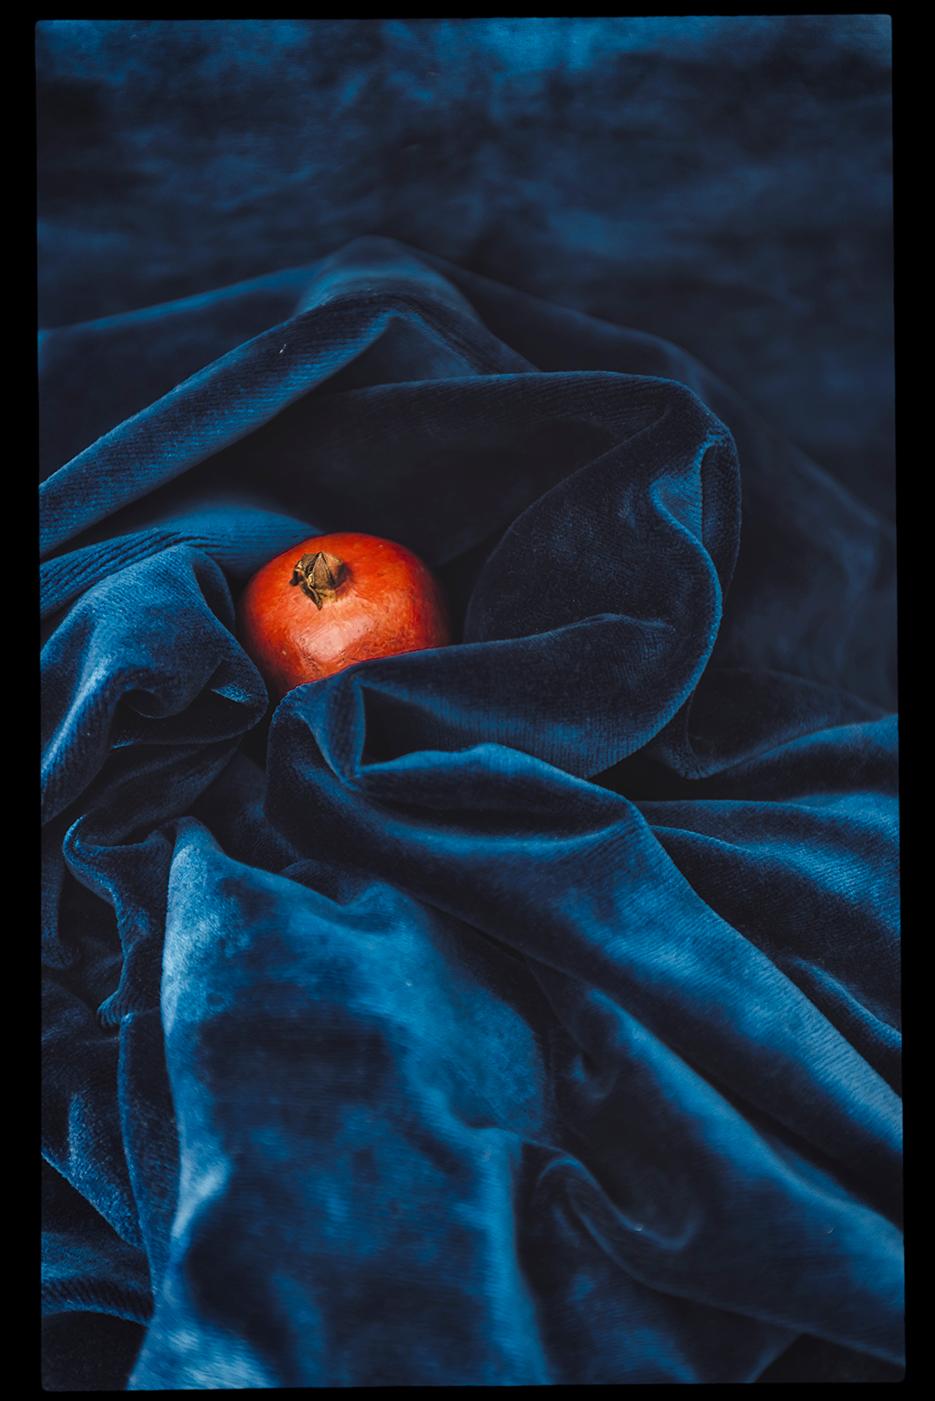 Pomegranates. Fruits & Food Photography. Photography by professional Indian lifestyle photographer Naina Redhu of Naina.co